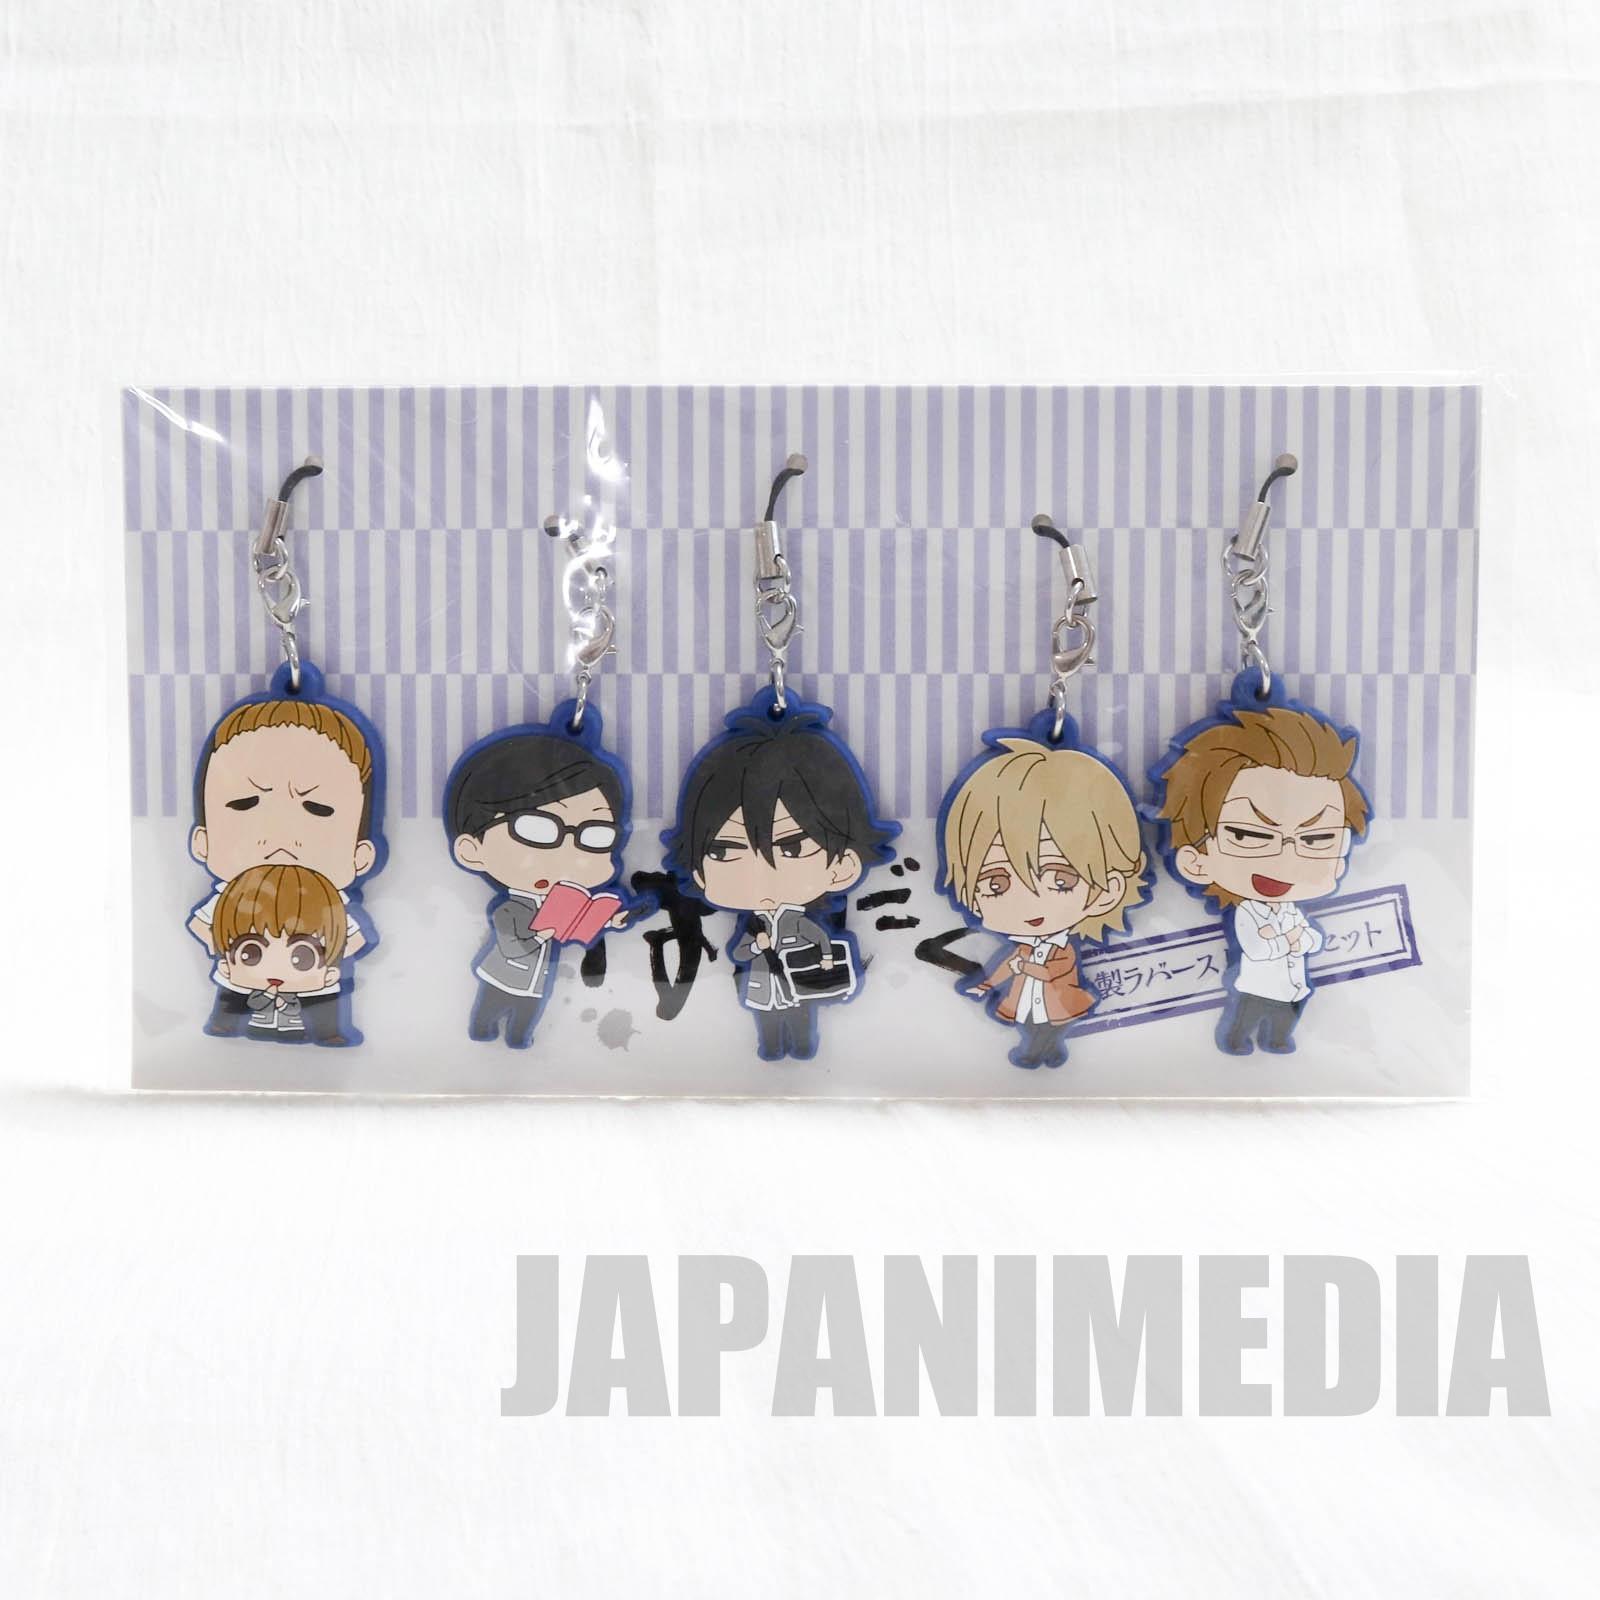 Handa-kun Mascot Rubber Strap 5pc Set [Handa | Aizawa | Reo | Tsutsui | Kawafuji] Square Enix JAPAN ANIME MANGA